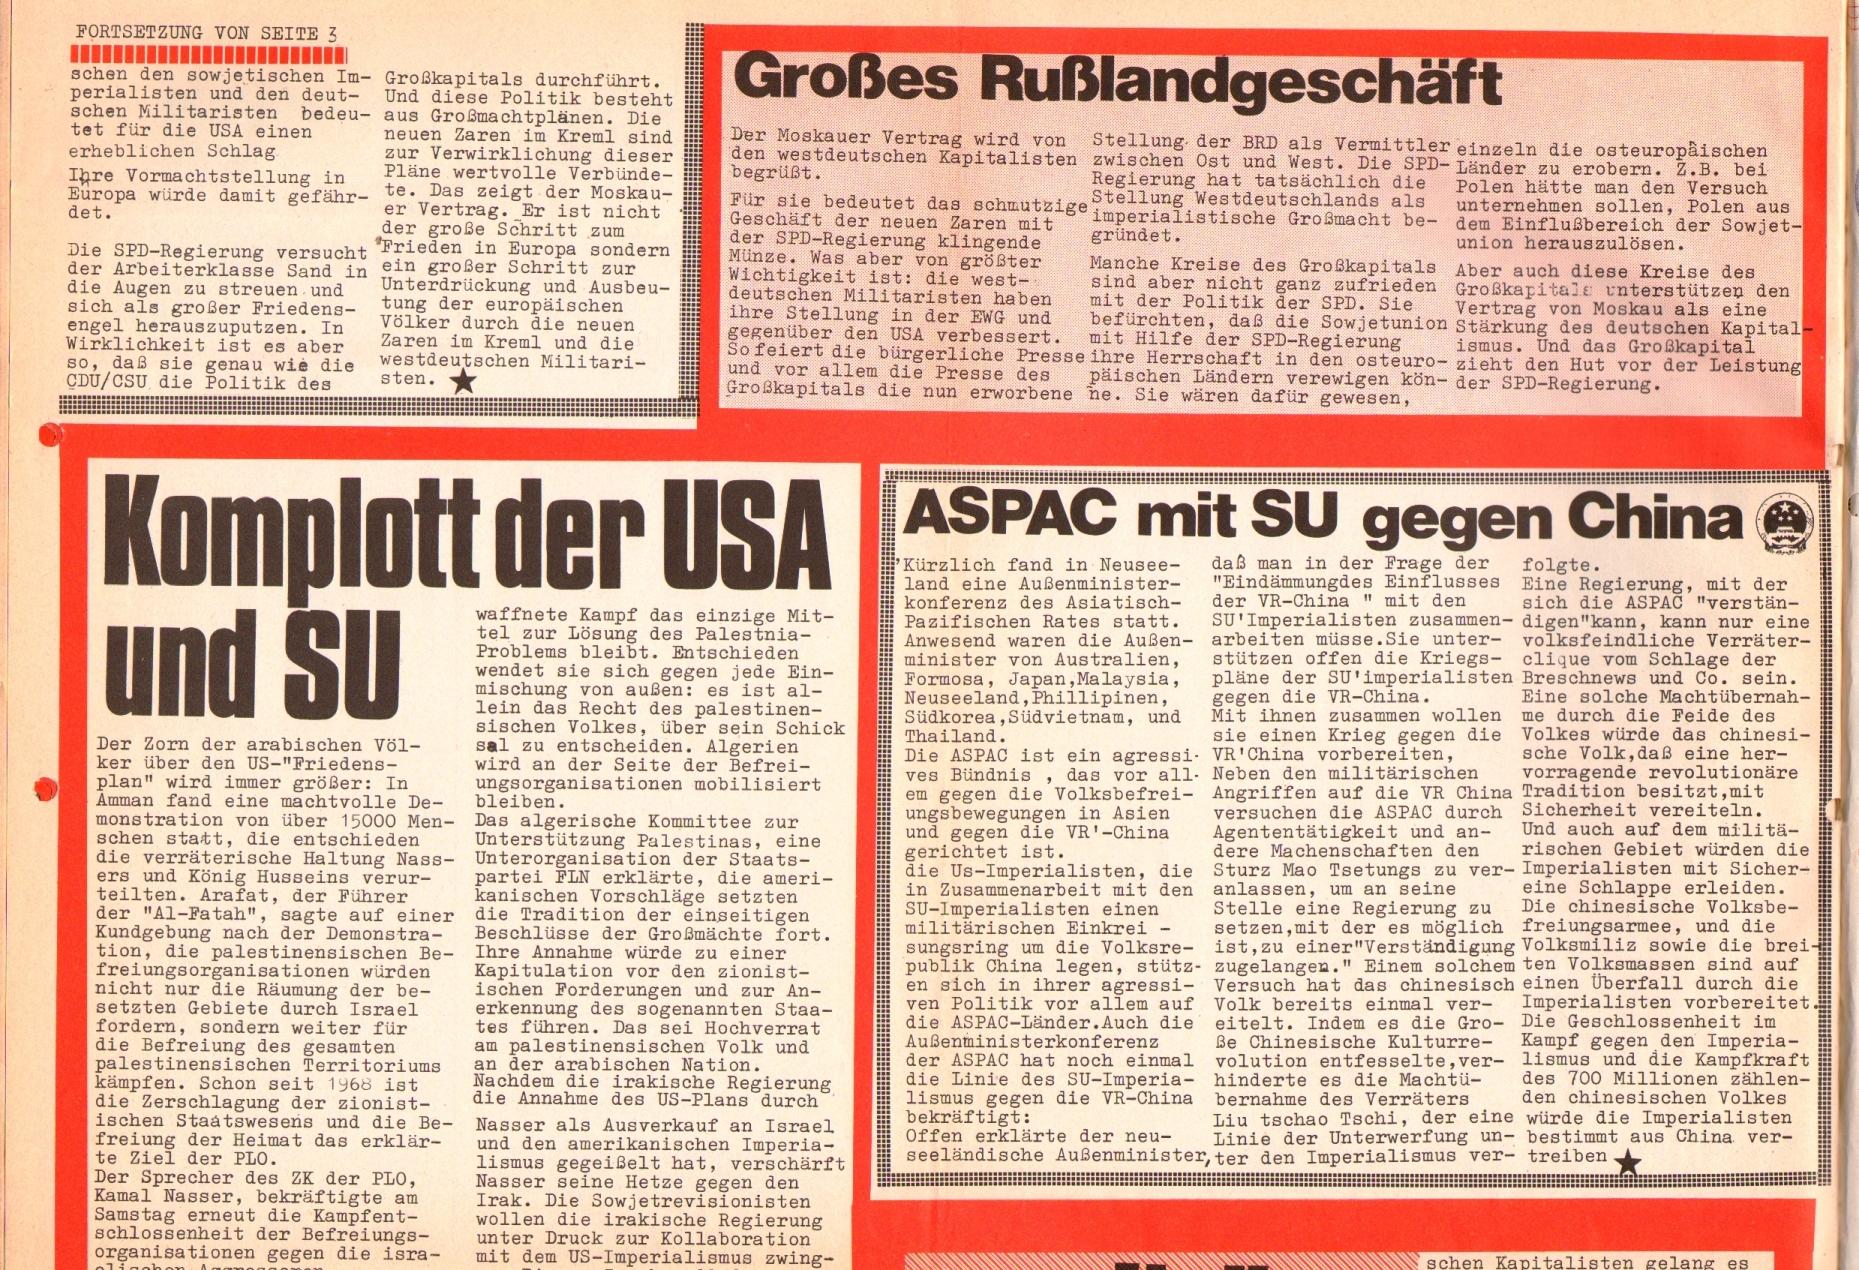 Rote Fahne, 1. Jg., 26. August 1970, Seite 6 oben